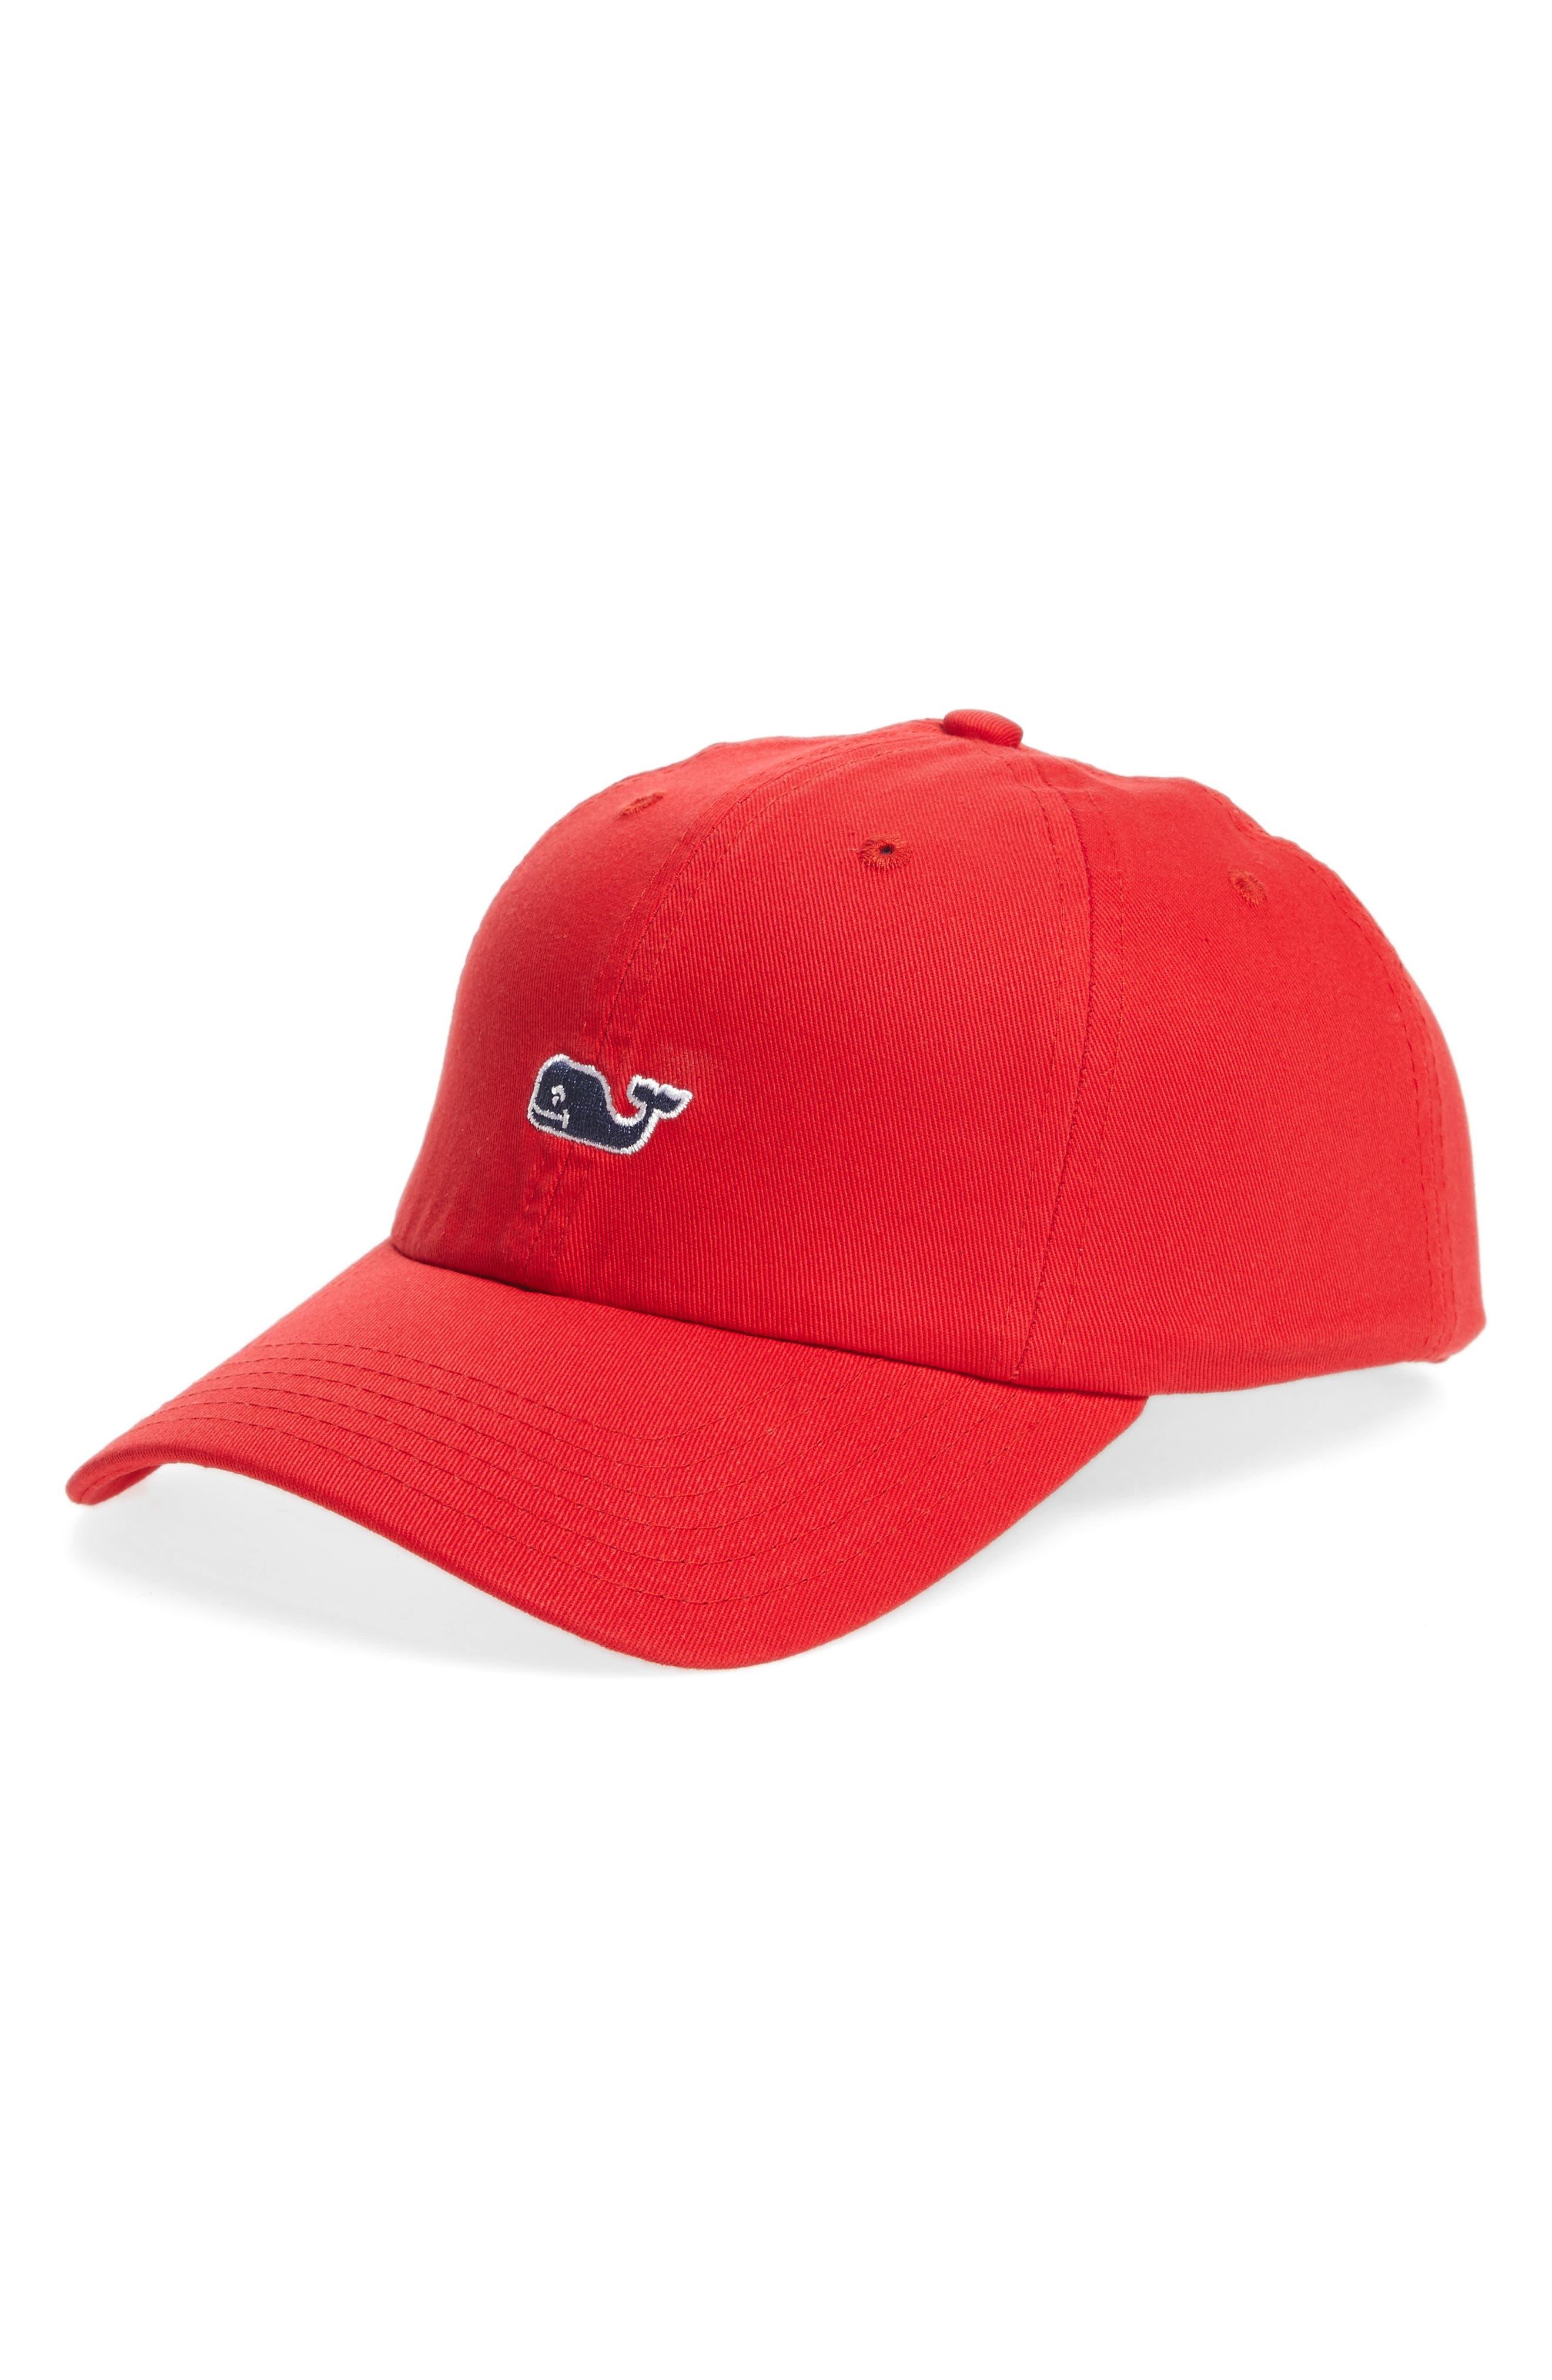 VINEYARD VINES Washed Classic Baseball Cap